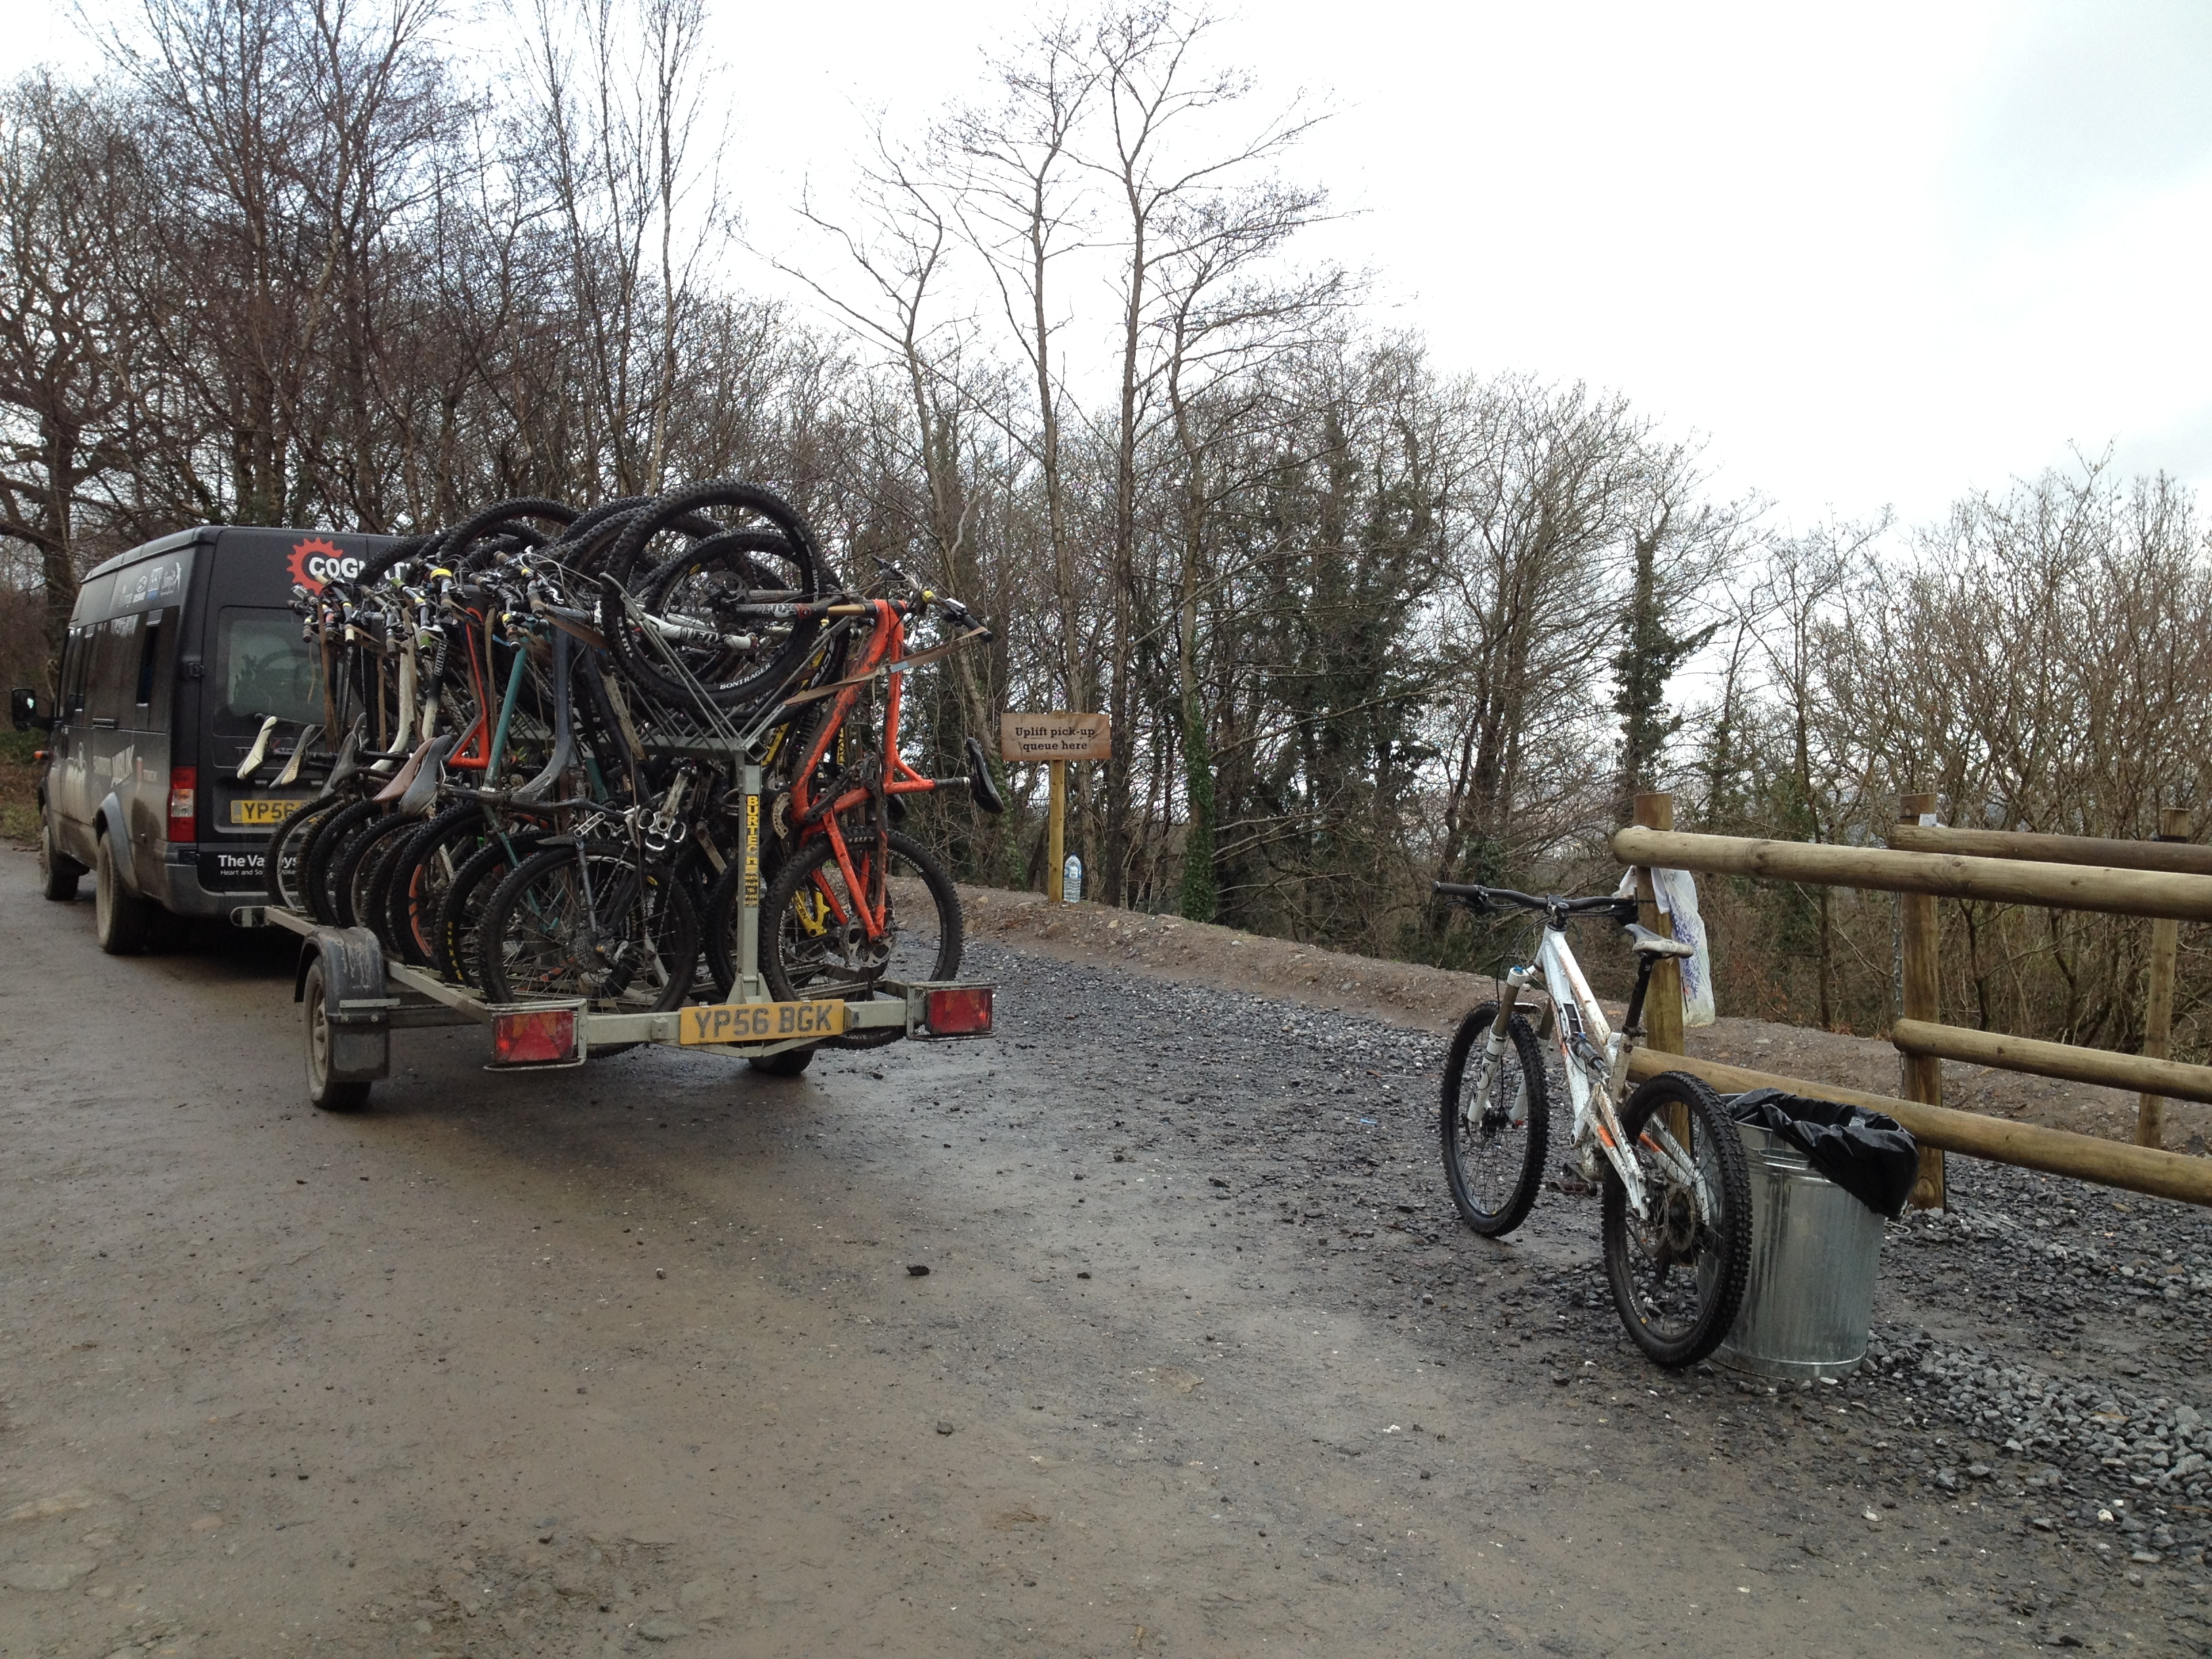 Bike Park Wales uplift